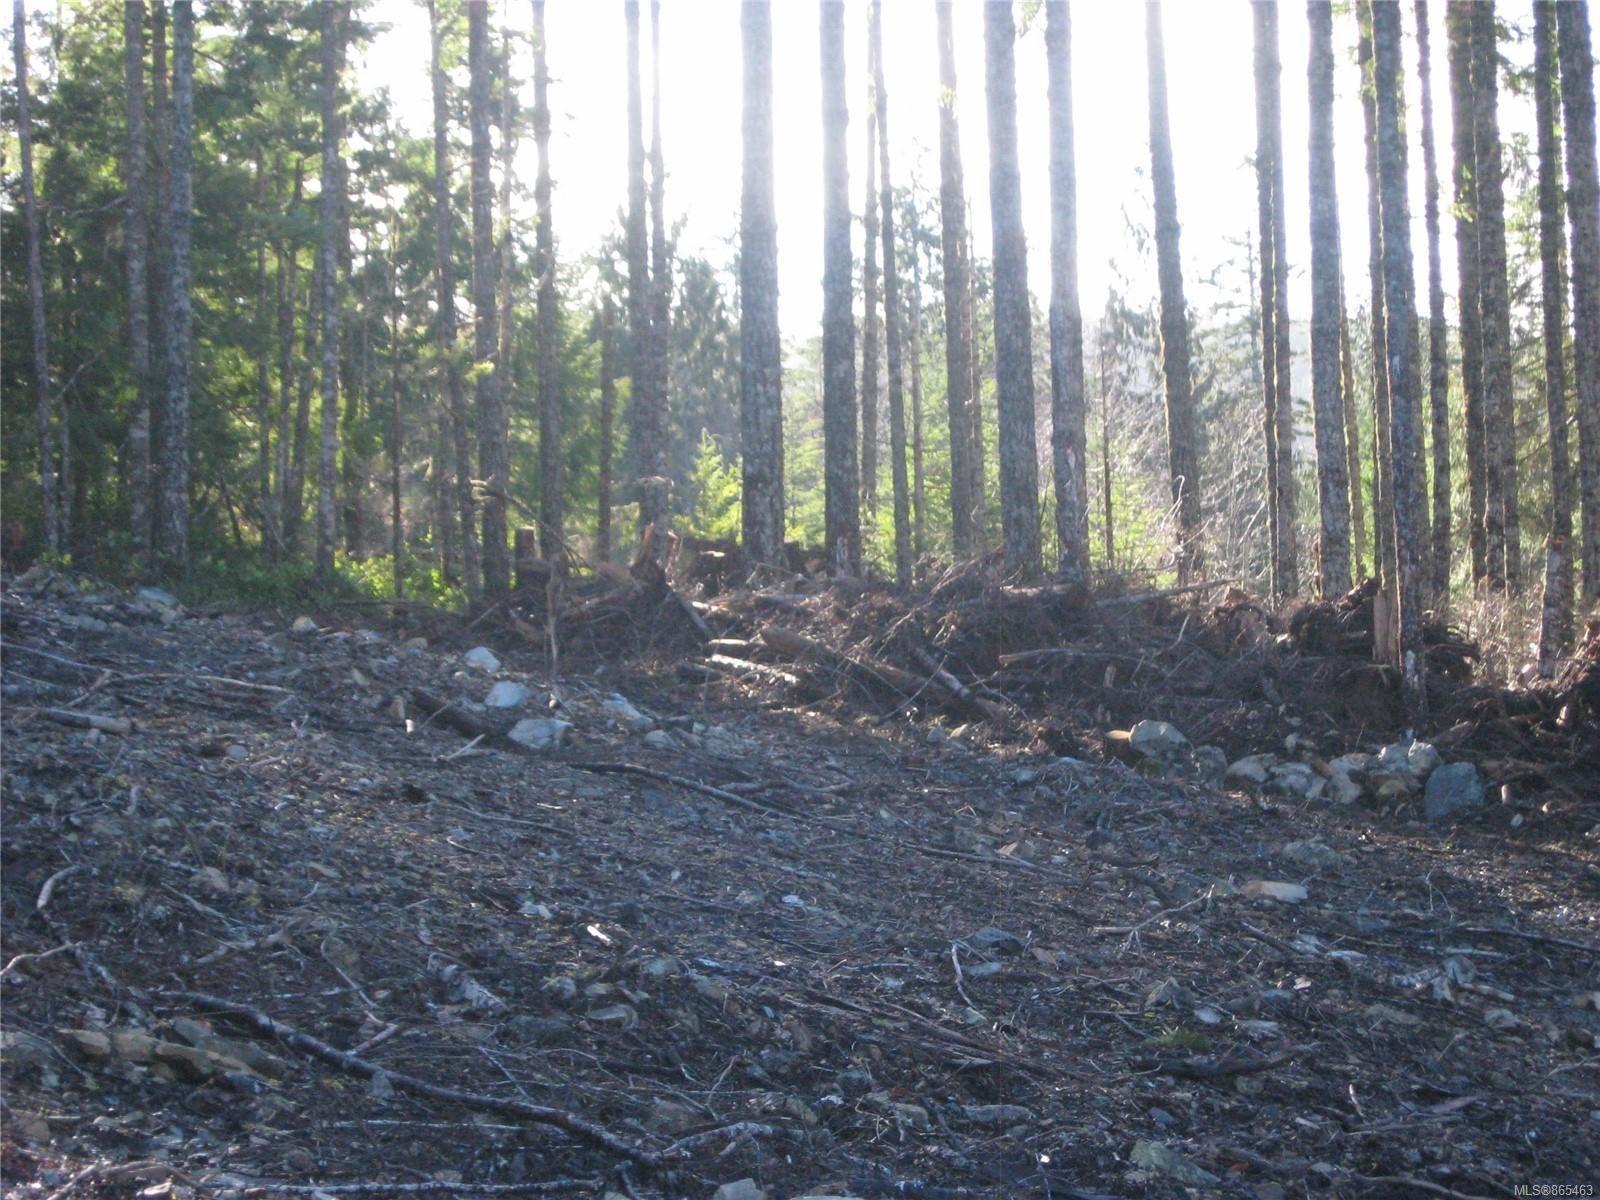 Photo 12: Photos: 1230 Cottonwood Rd in : NI Kelsey Bay/Sayward Land for sale (North Island)  : MLS®# 865463